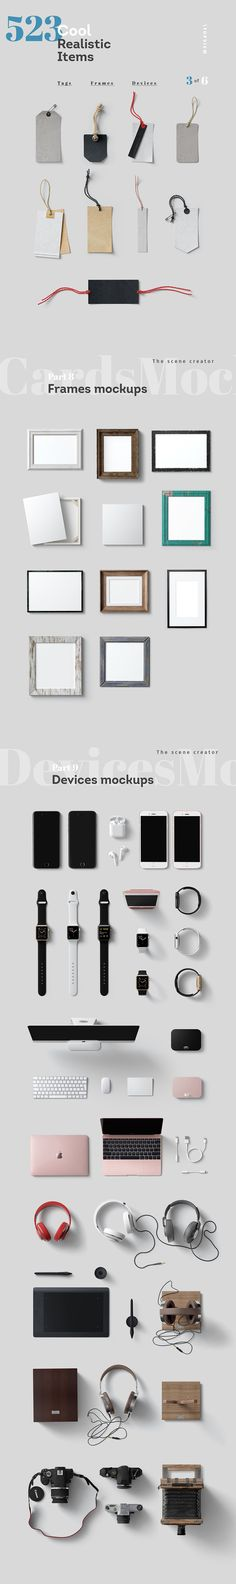 The Scene Creator | Topview by Aleksey_Belorukov on @creativemarket #ad